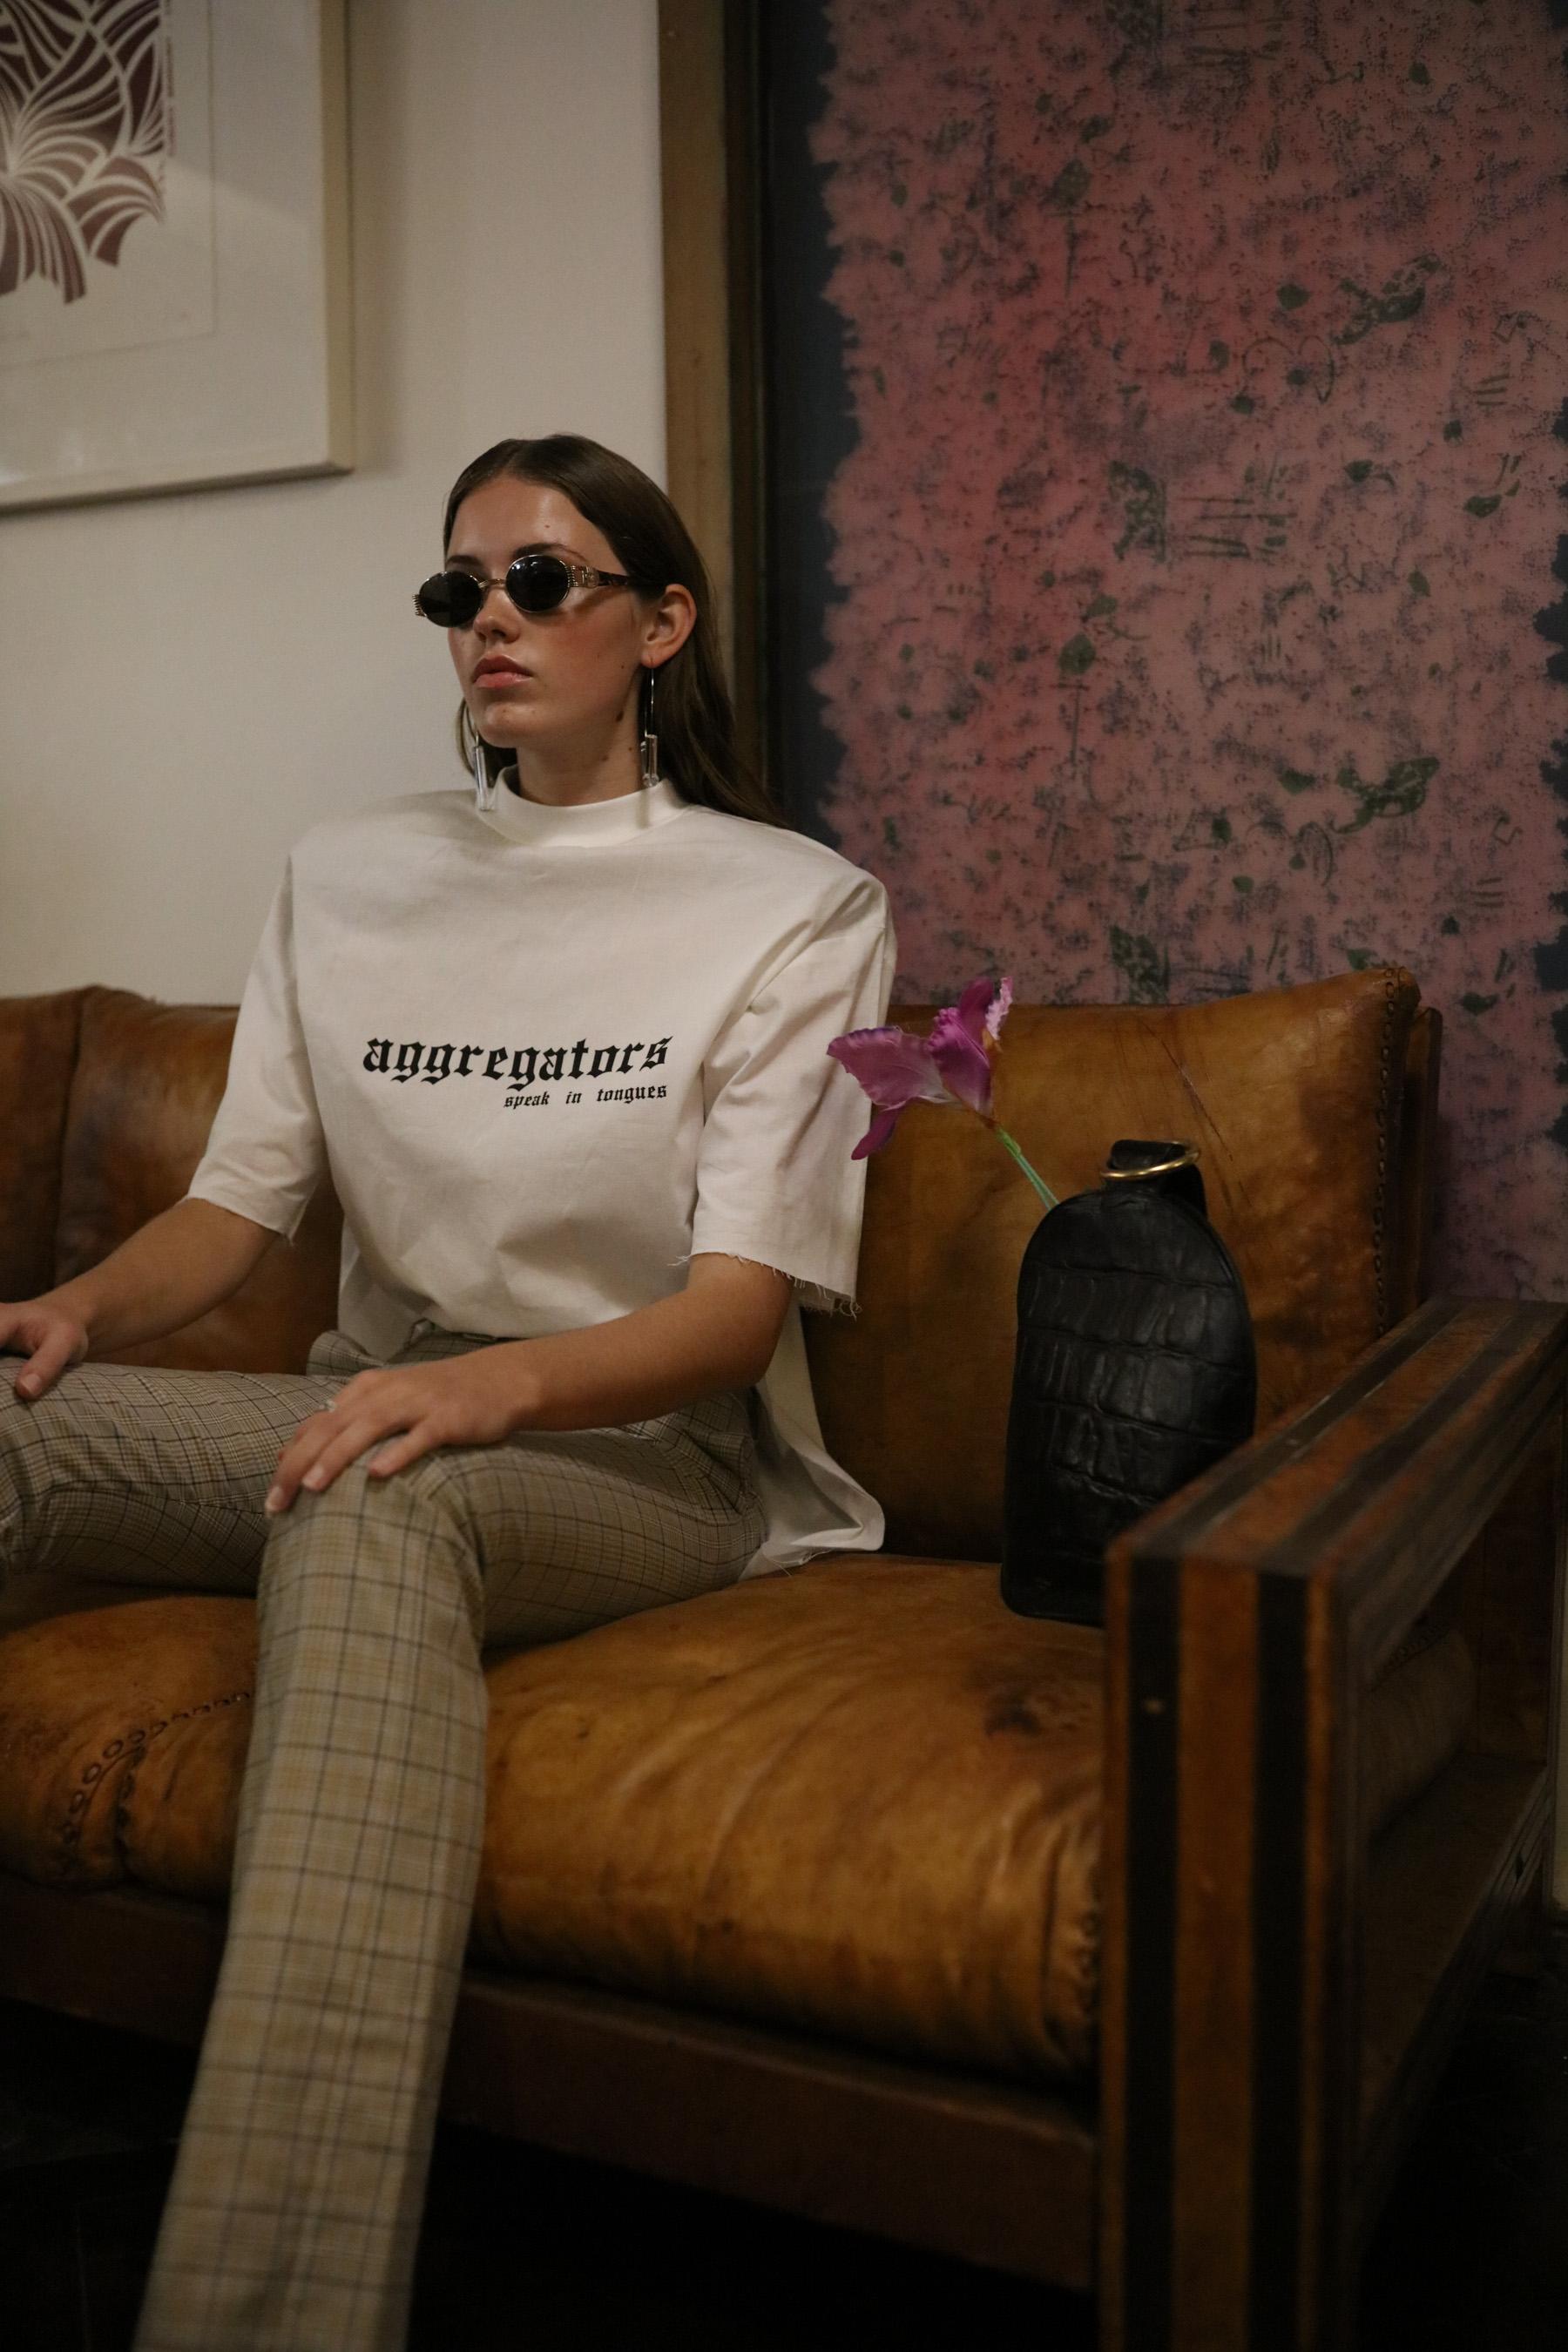 Sarah wears Samantha Diorio & Jake Paraskeva 'Aggregators Speak in Tongues' T-shirt